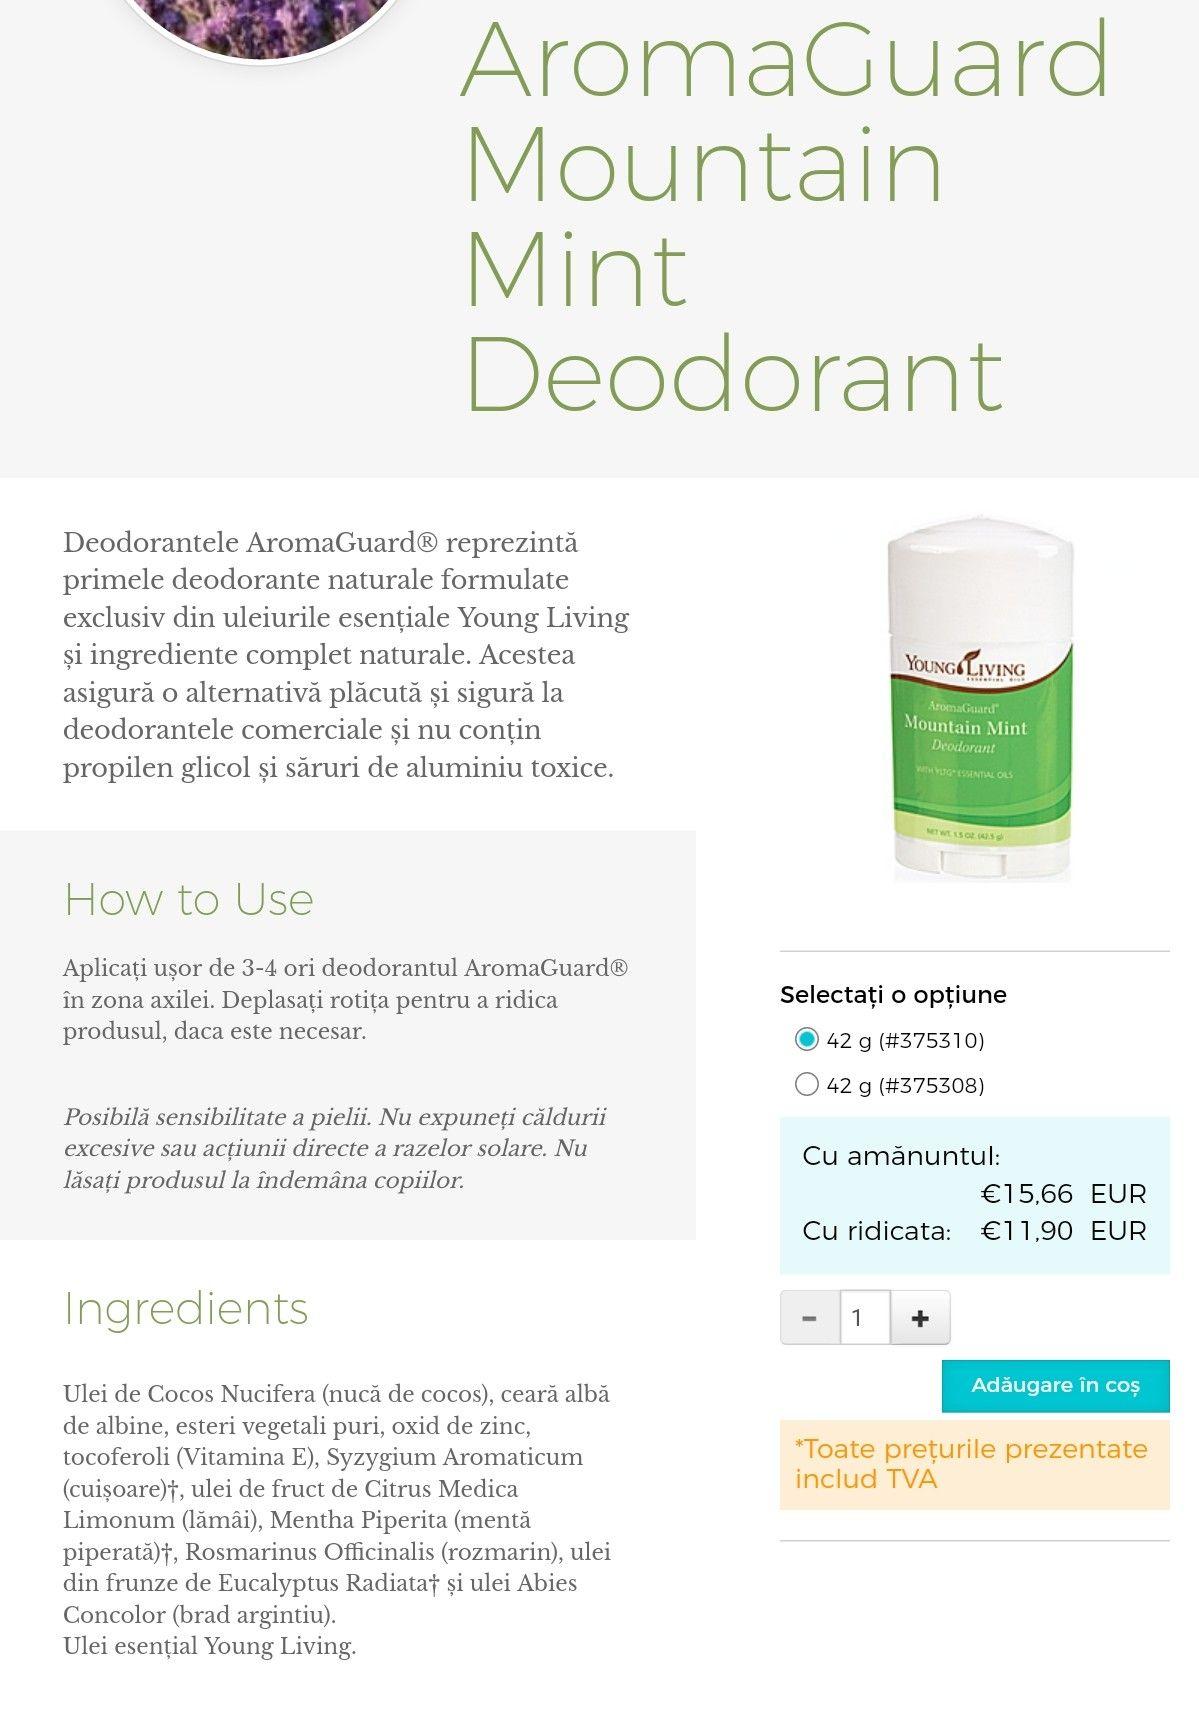 Aromaguard mountain mint deodorant 15 oz deodorant